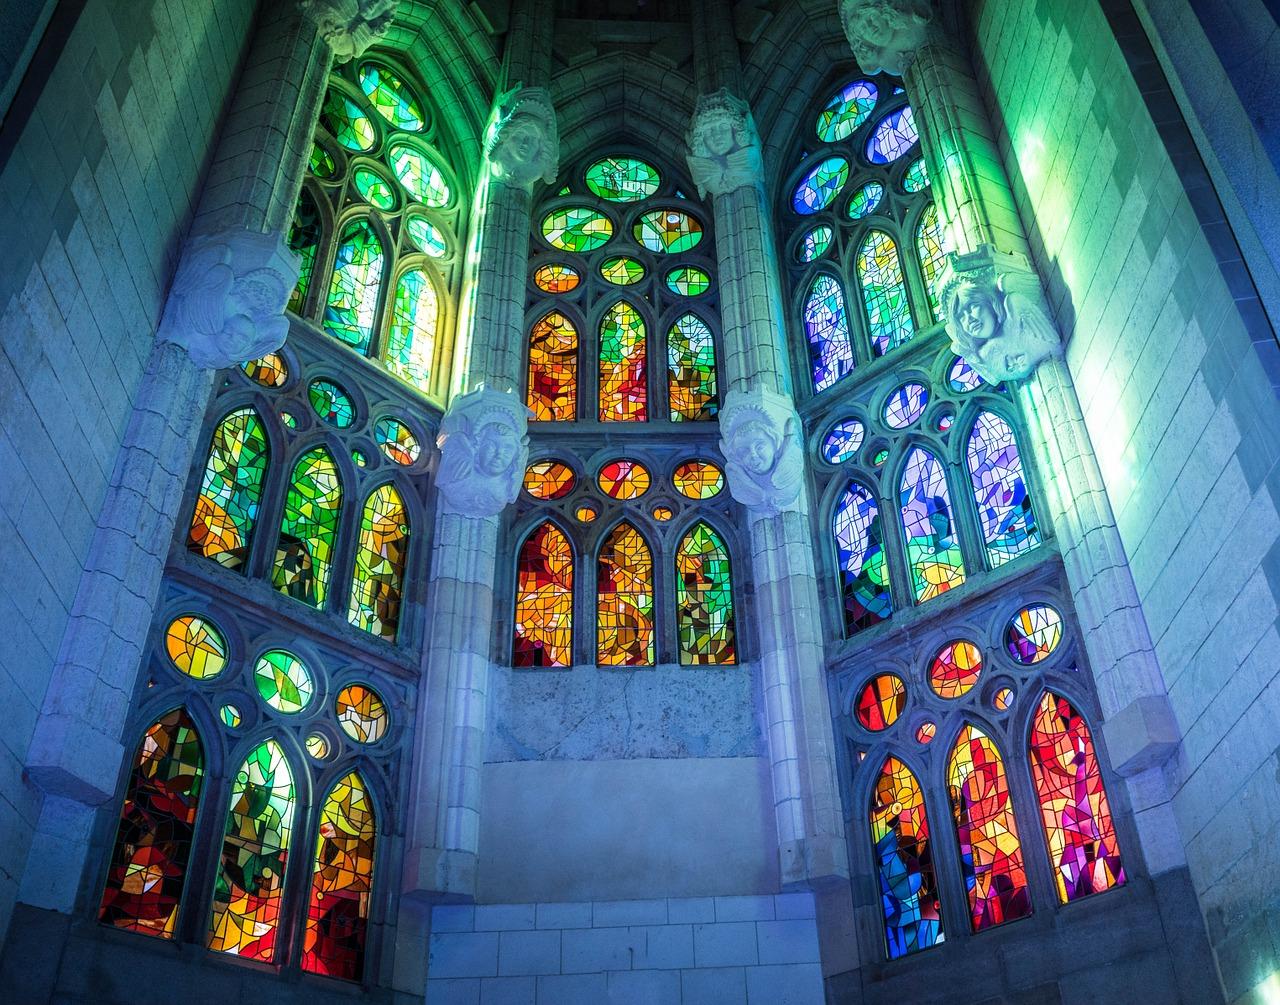 sagrada-familia-cathedral-1147932_1280